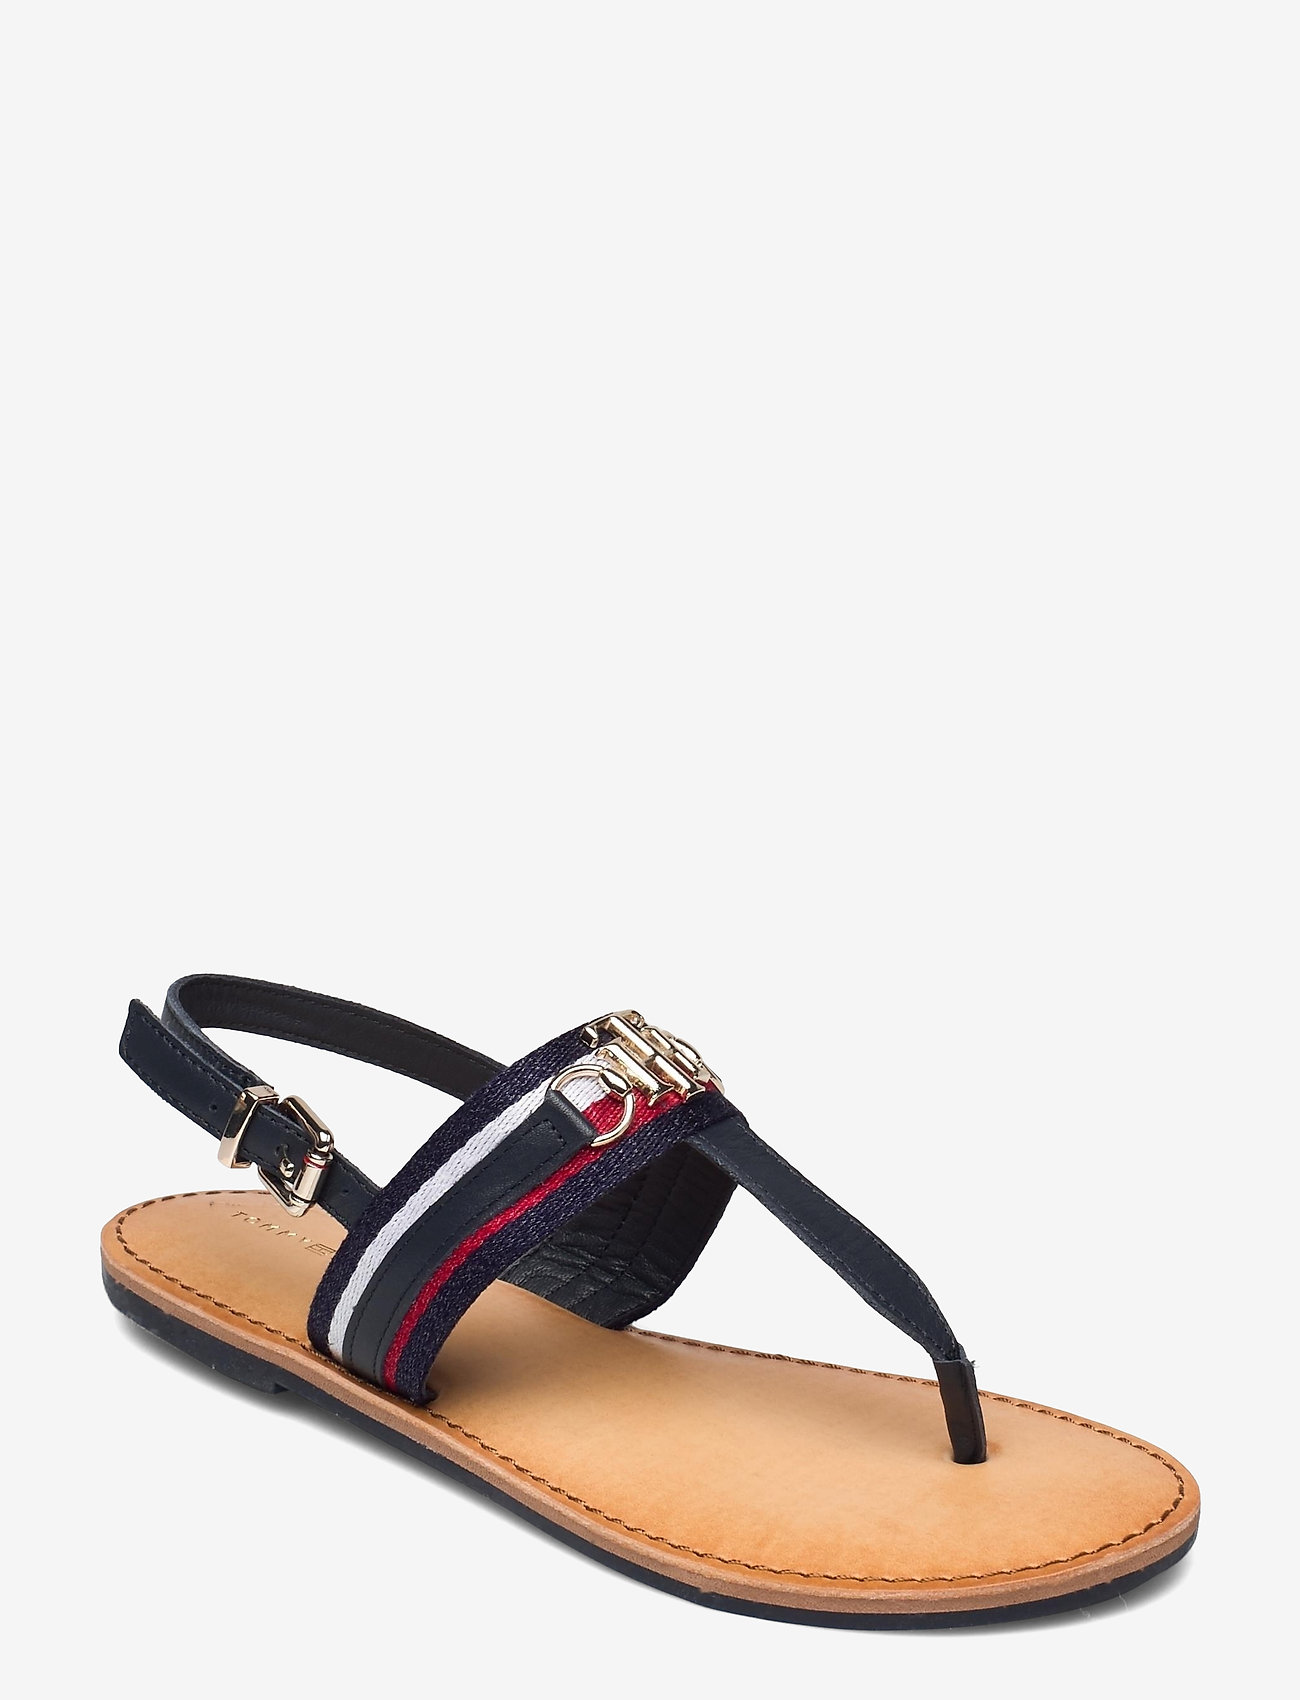 Tommy Hilfiger - SHIMMERY RIBBON FLAT SANDAL - flat sandals - desert sky - 0